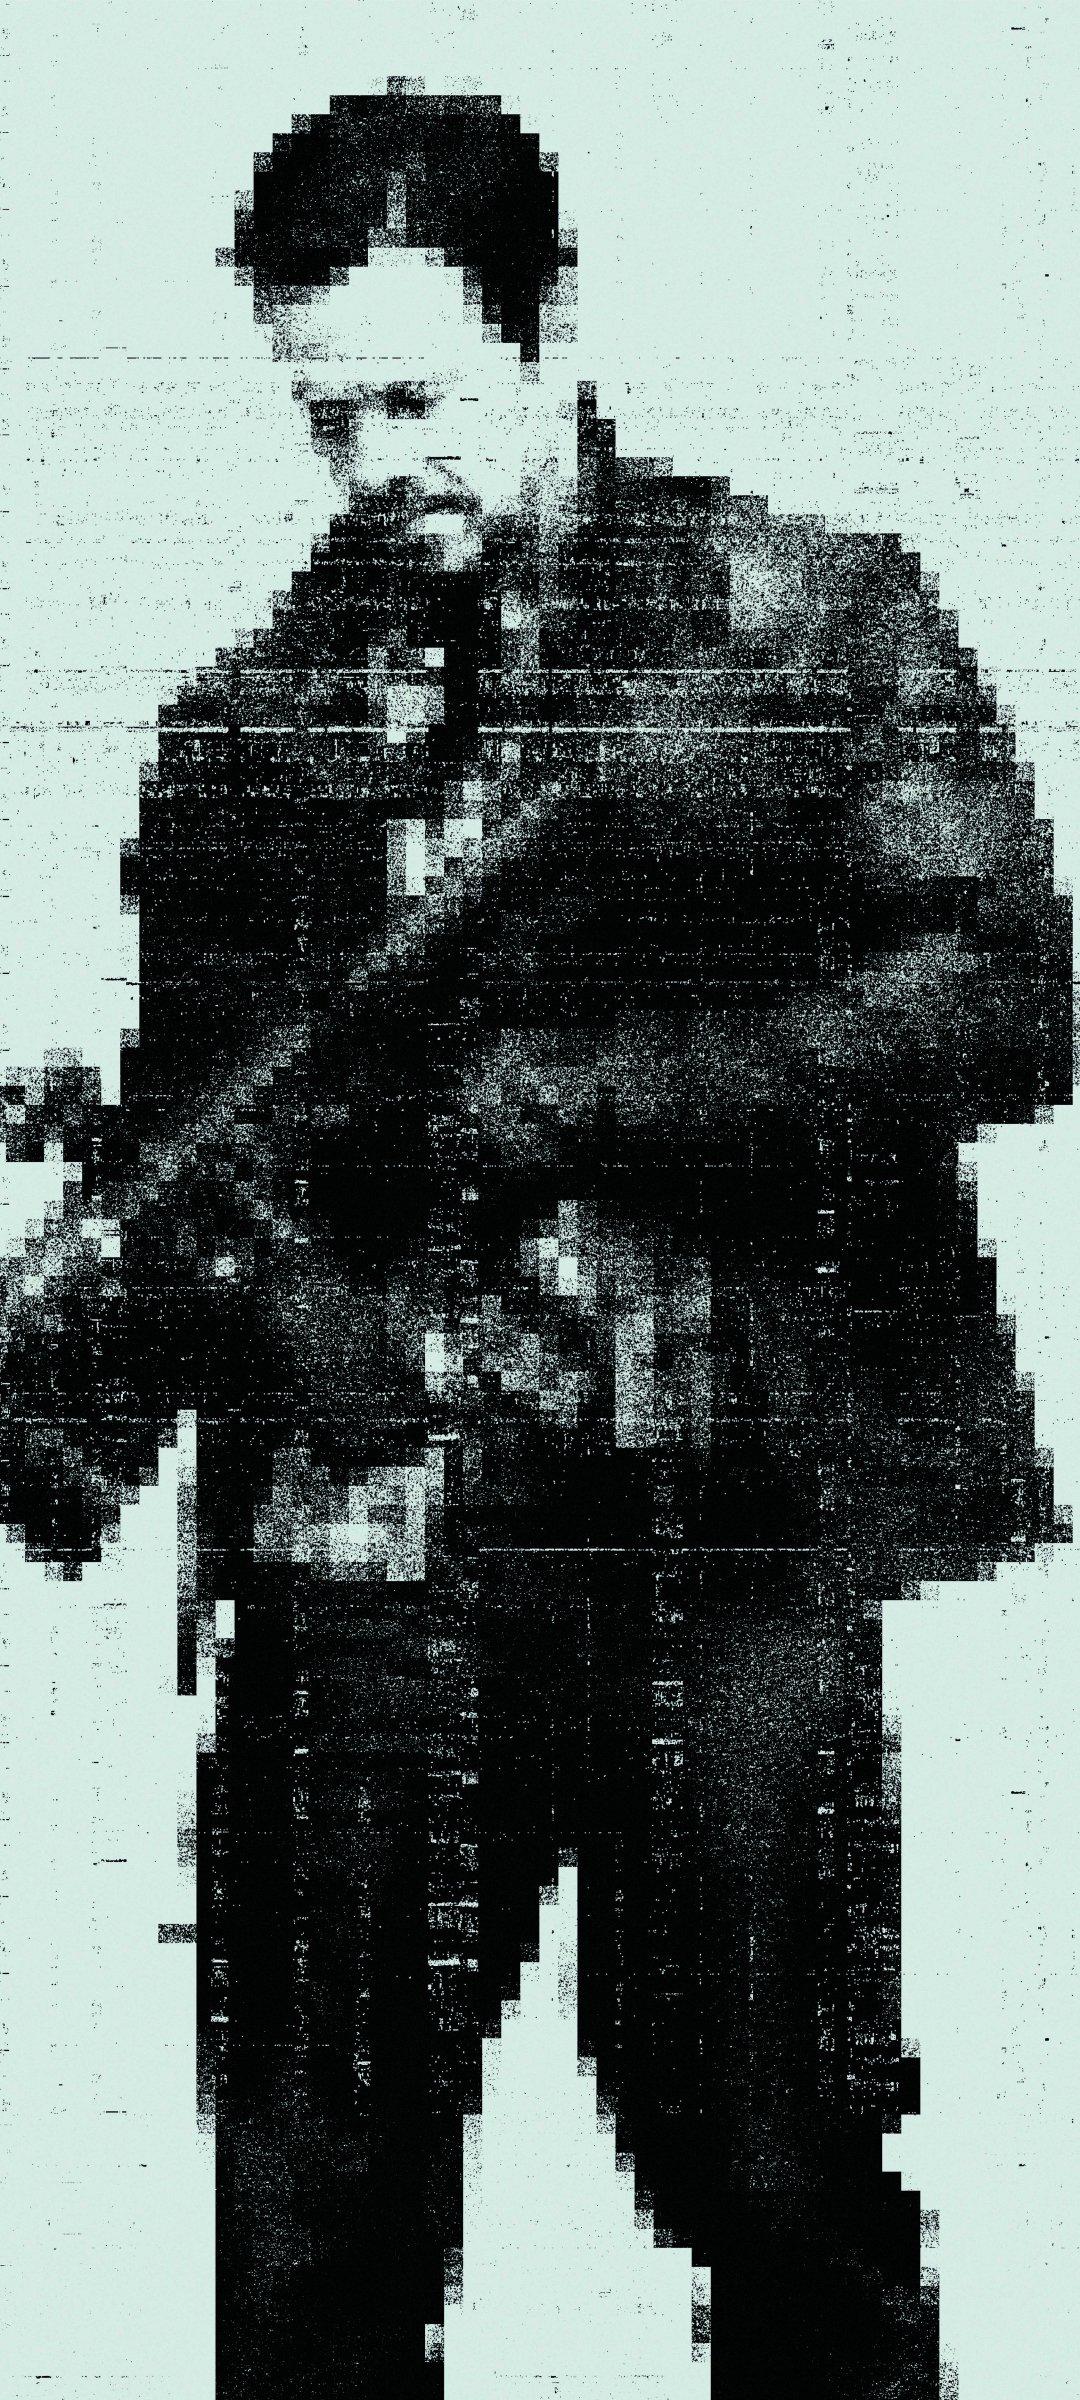 Wallpaper 934128